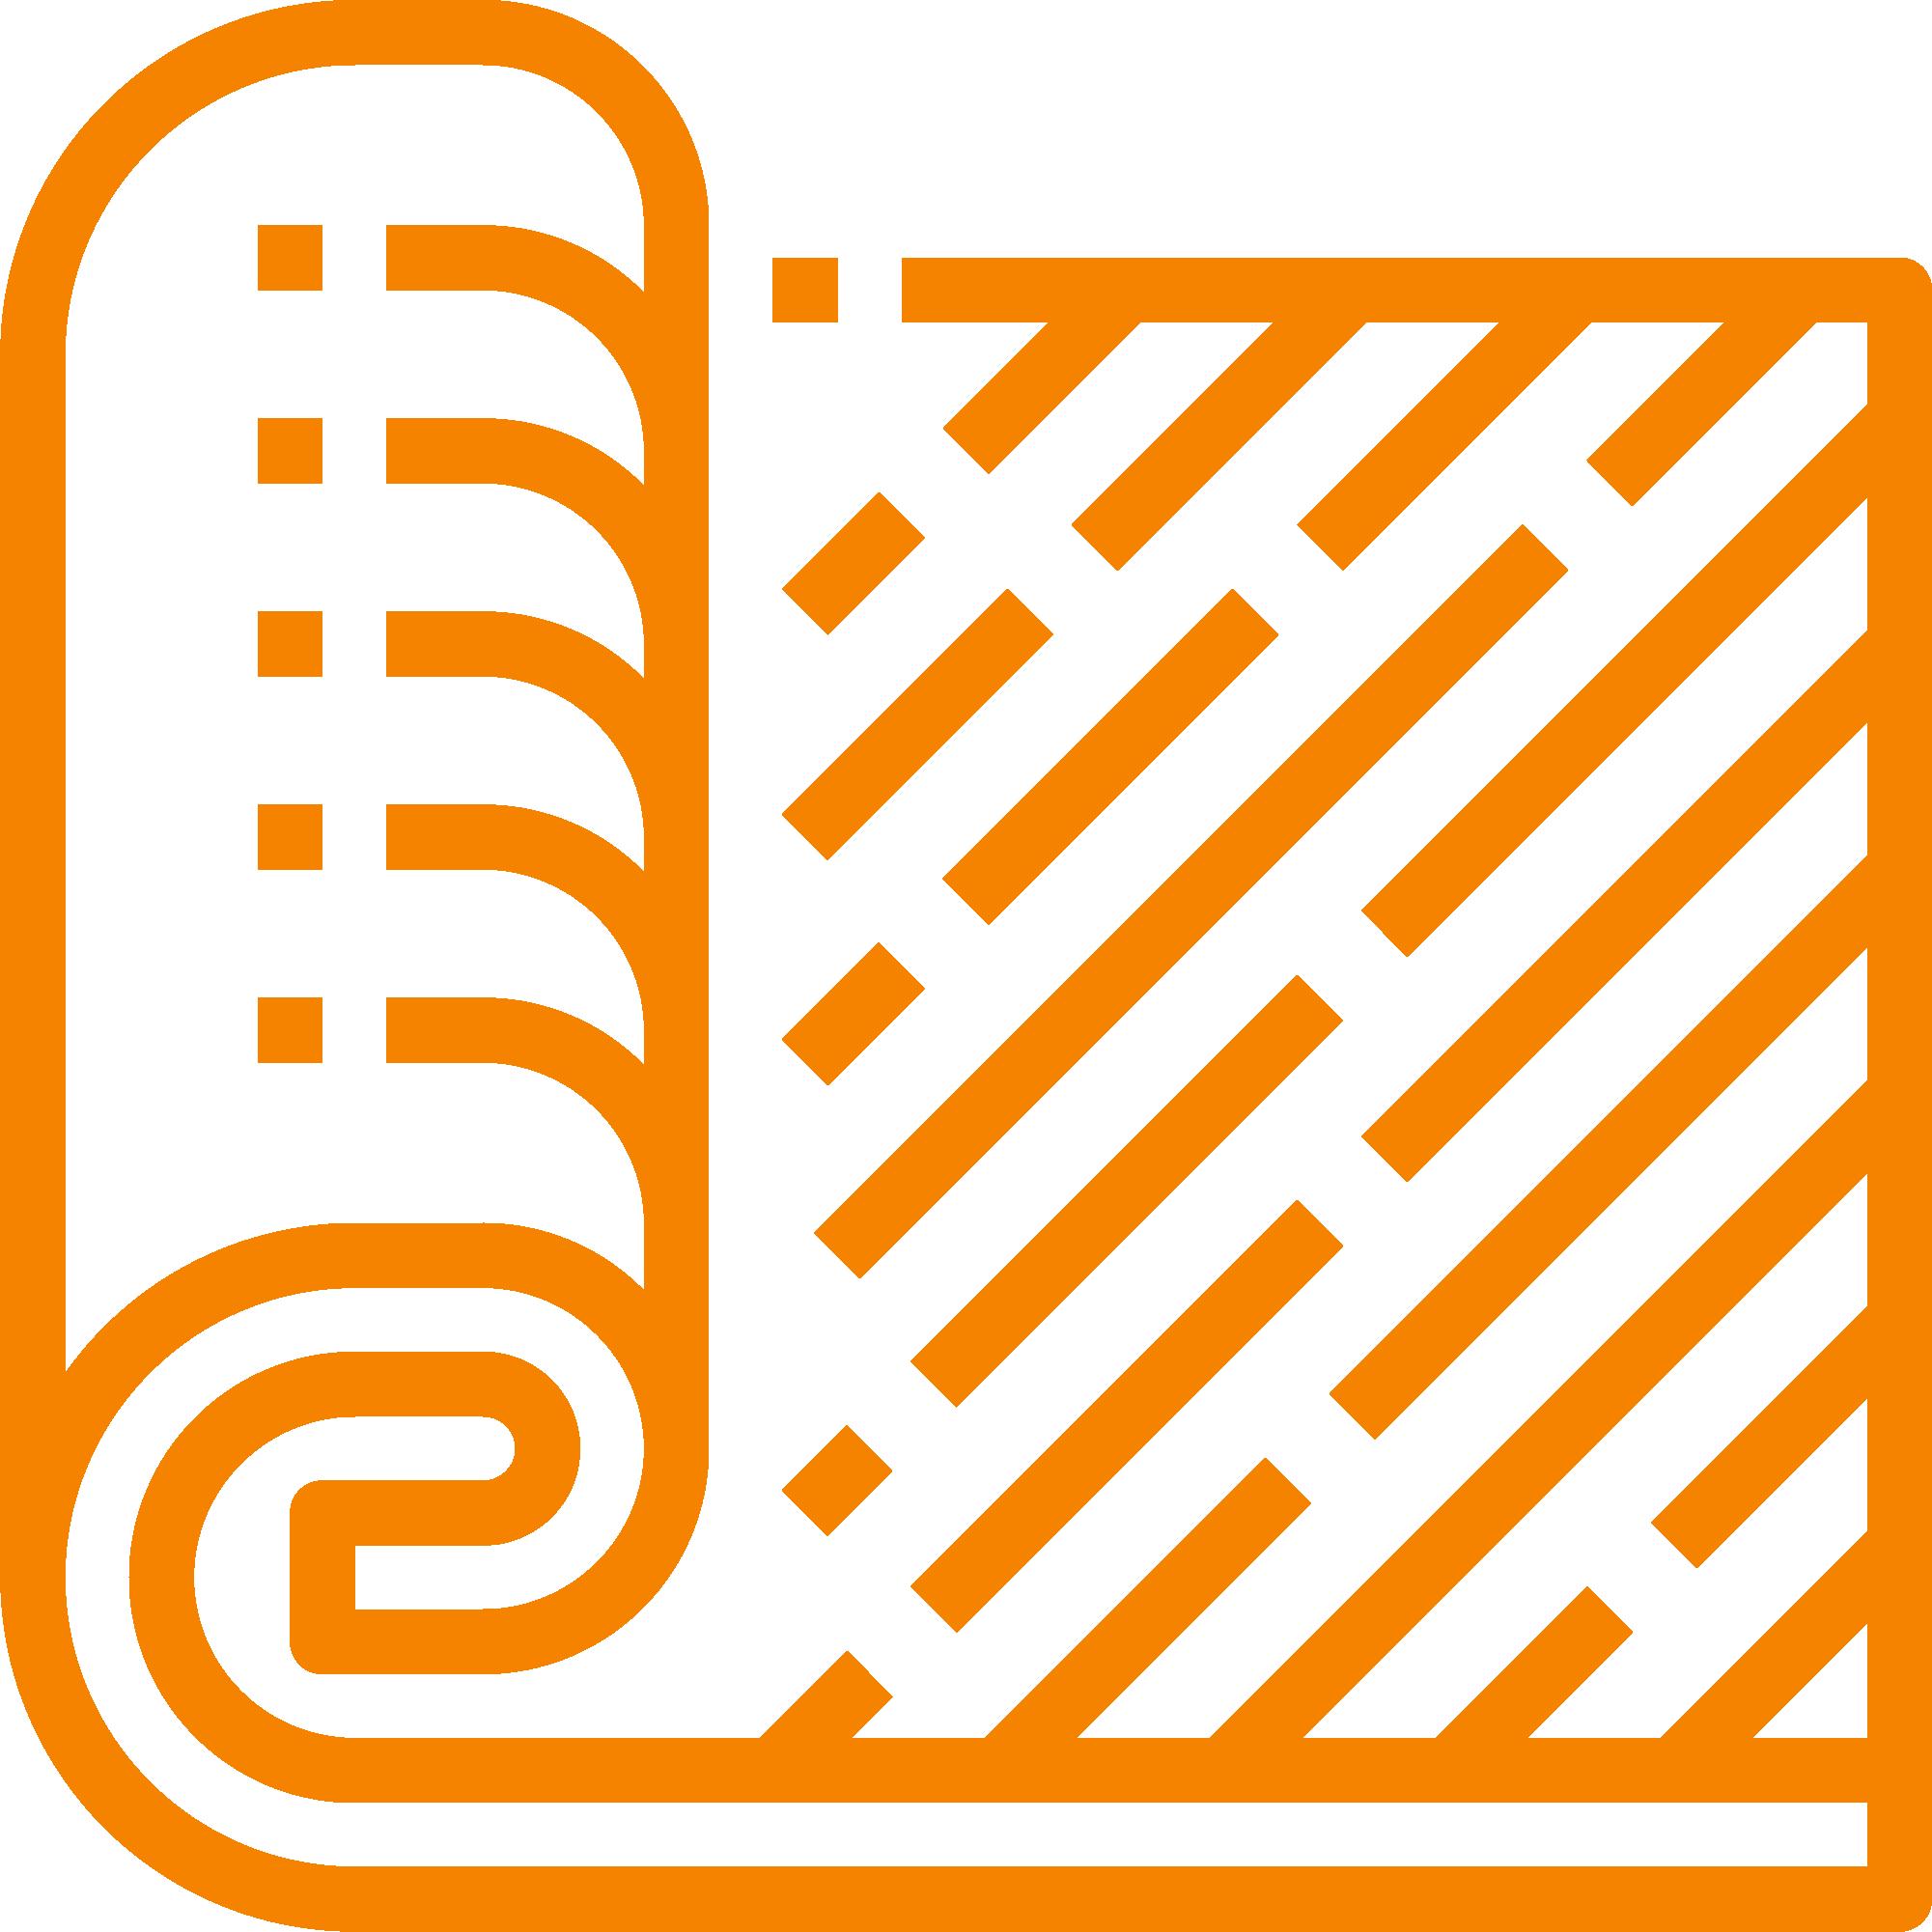 carpet roll orange icon